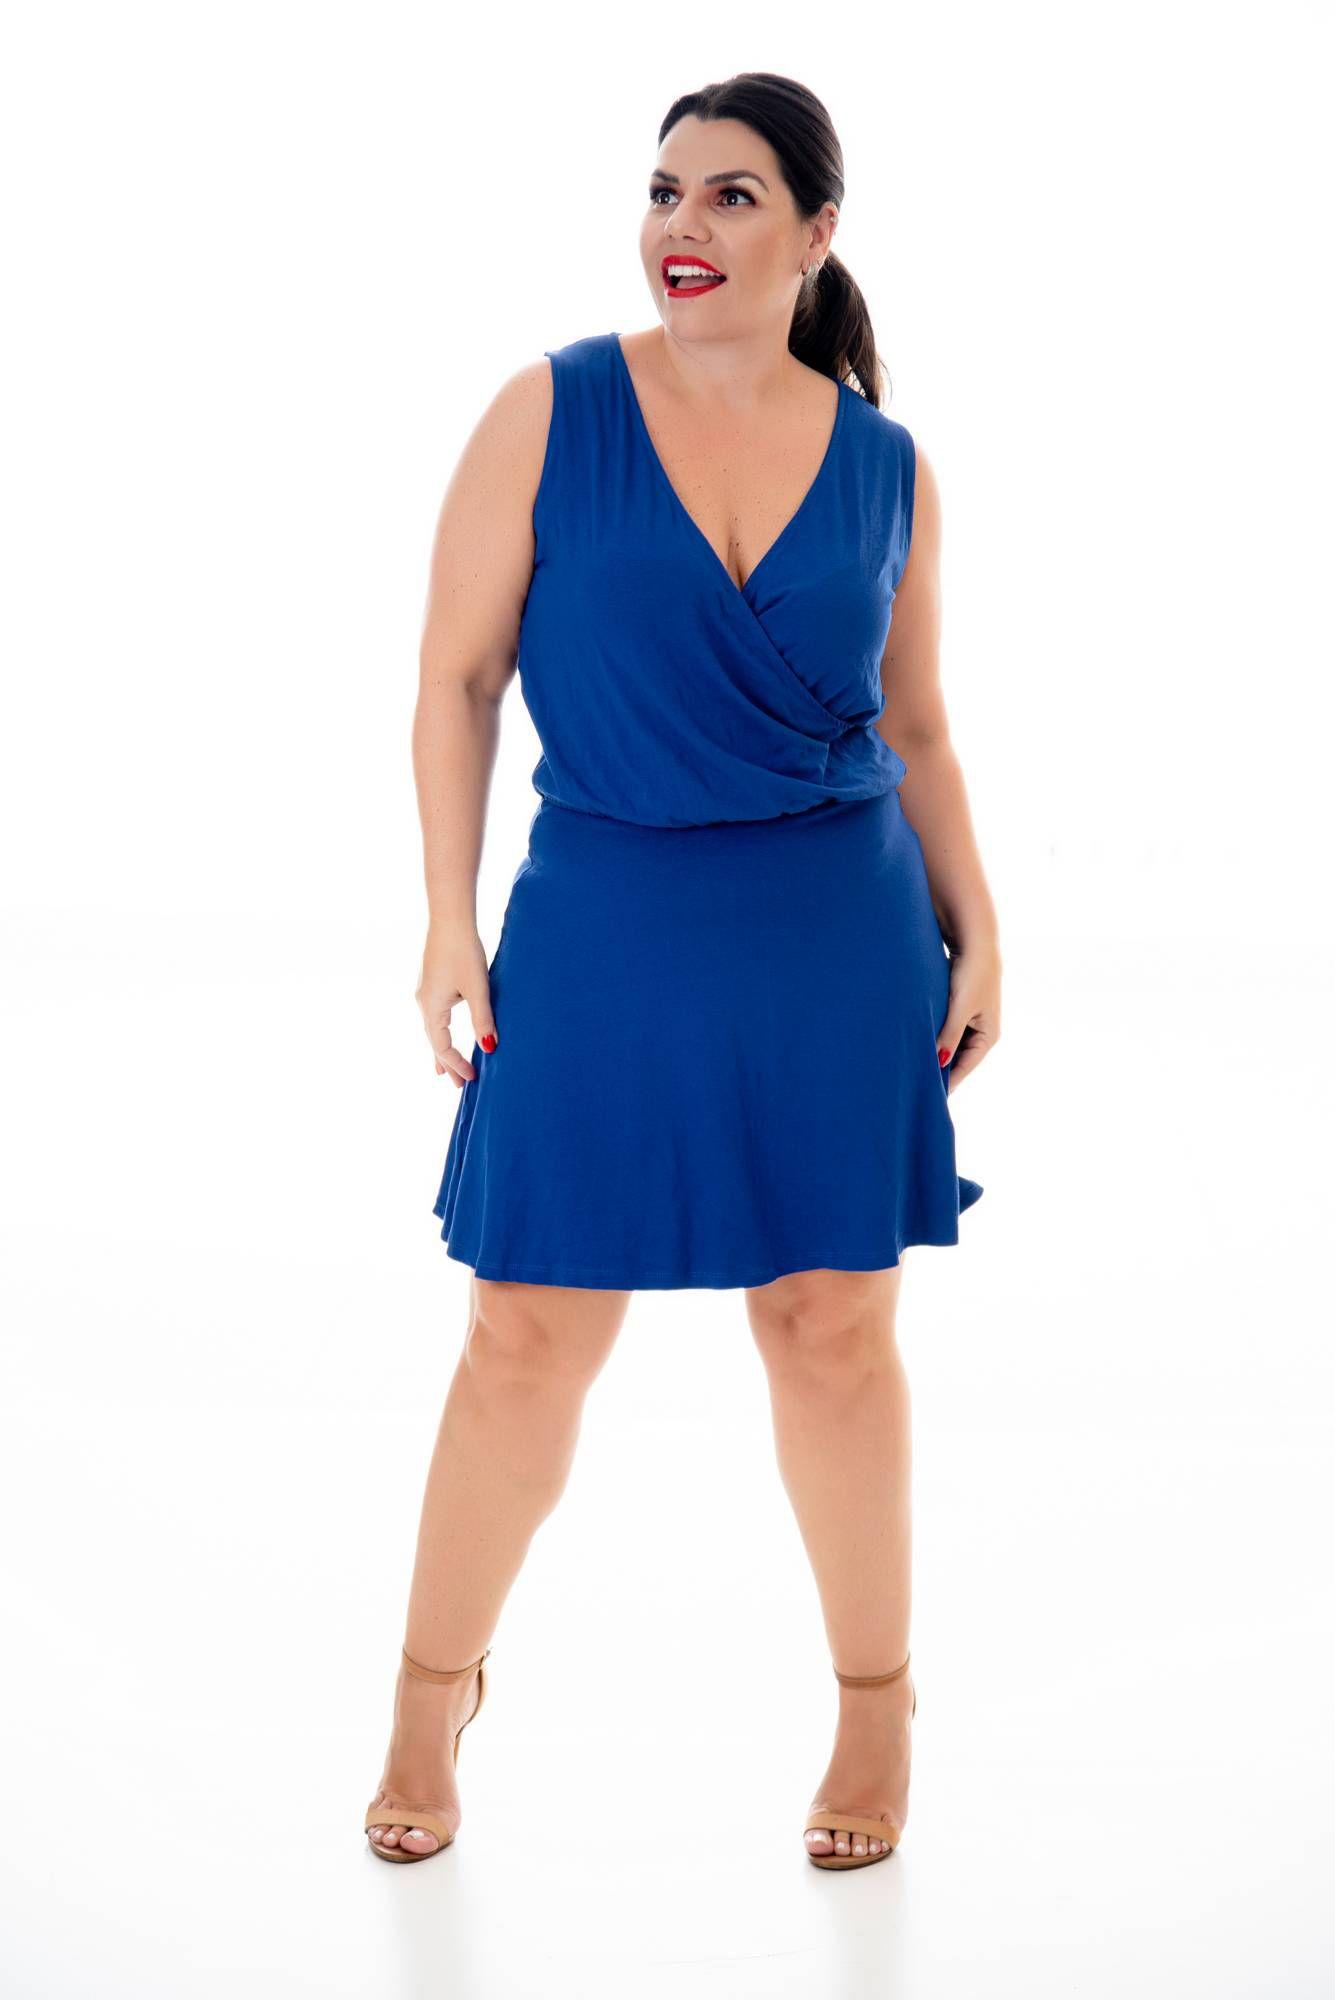 Vestido curto regata Azul Royal